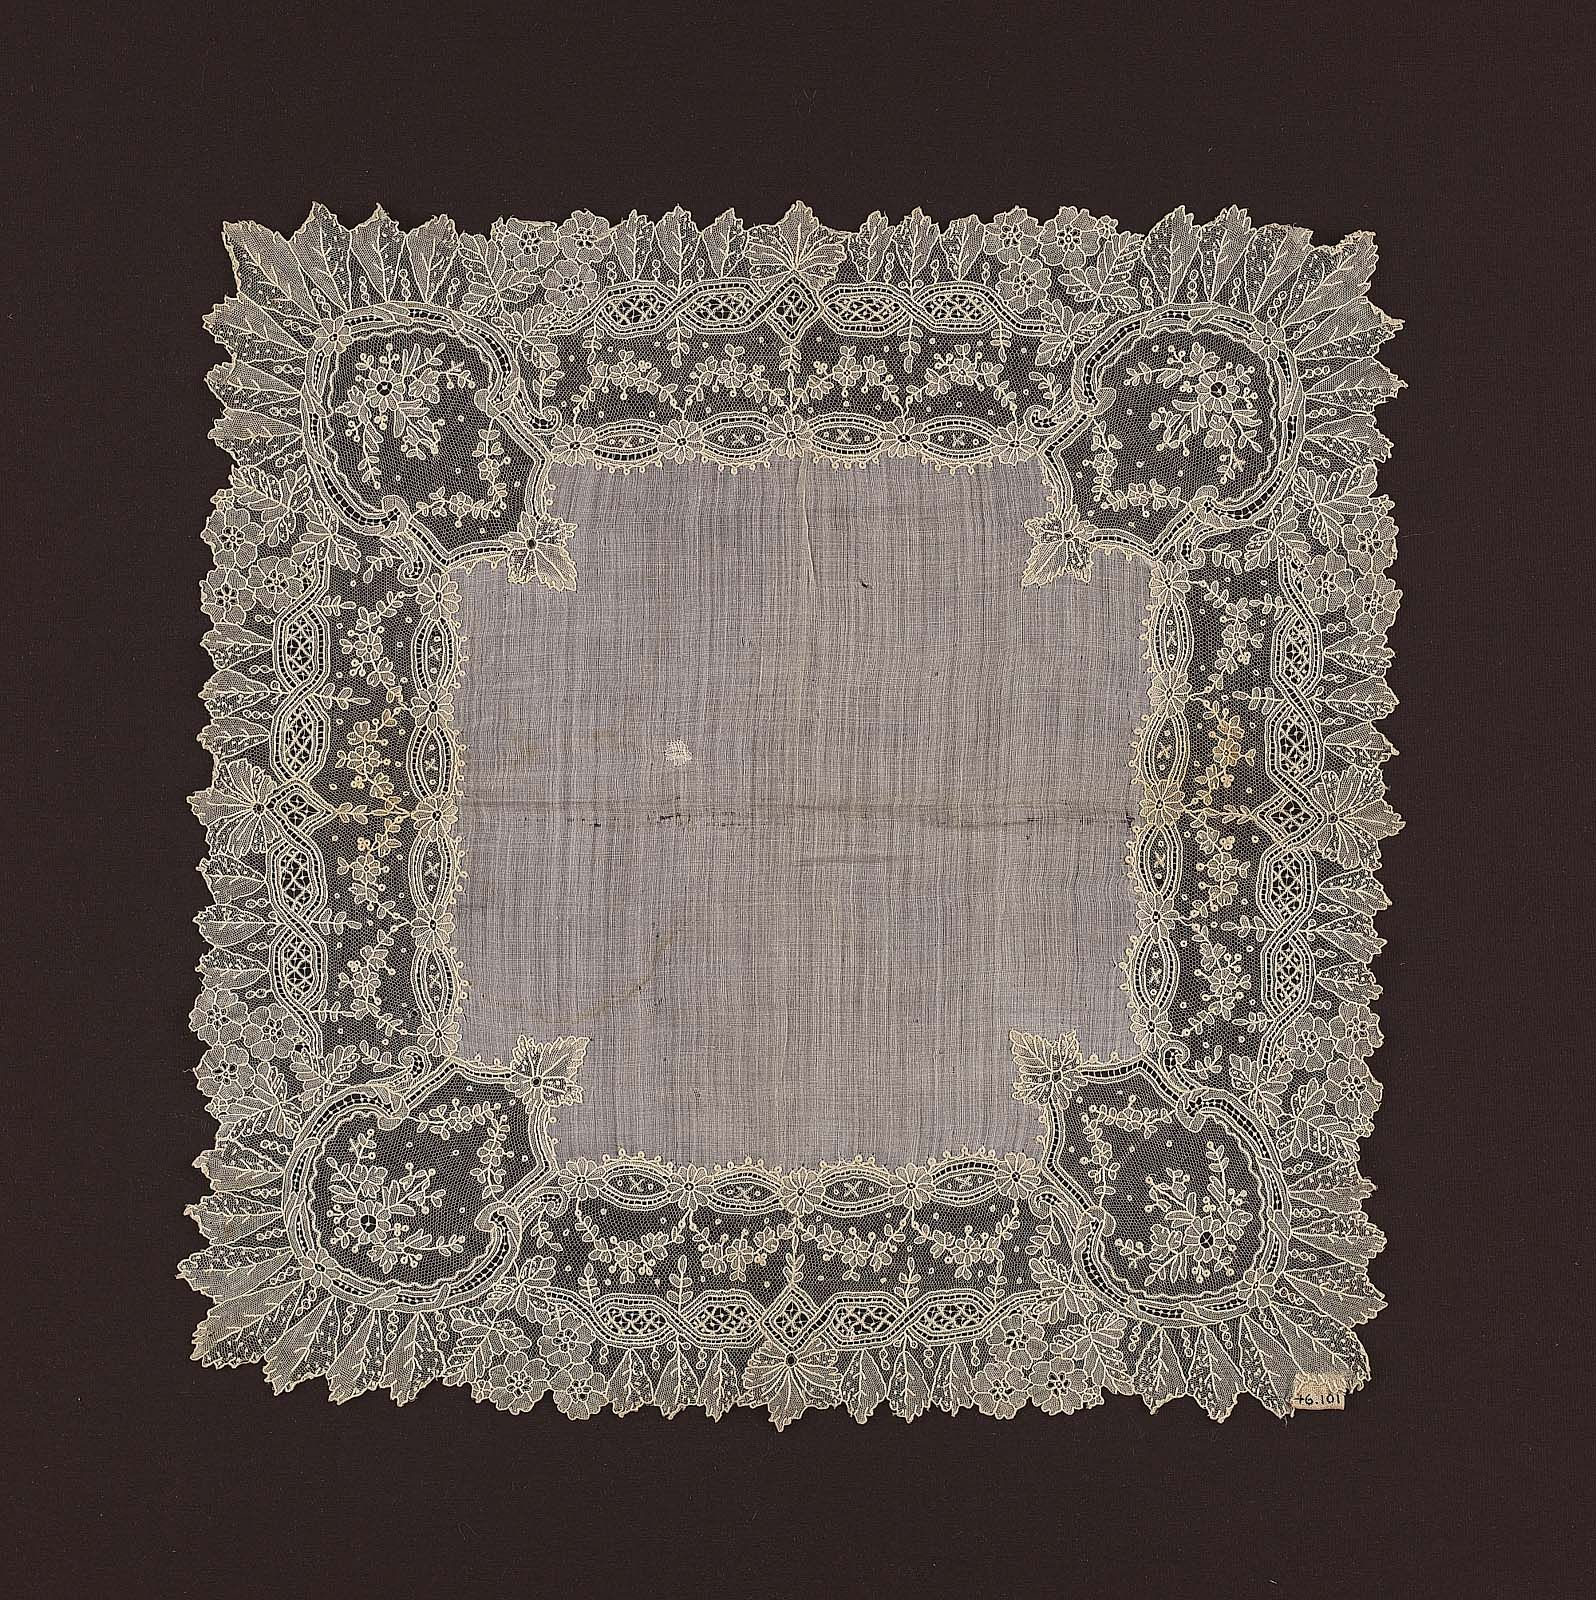 Handkerchief | Museum of Fine Arts, Boston